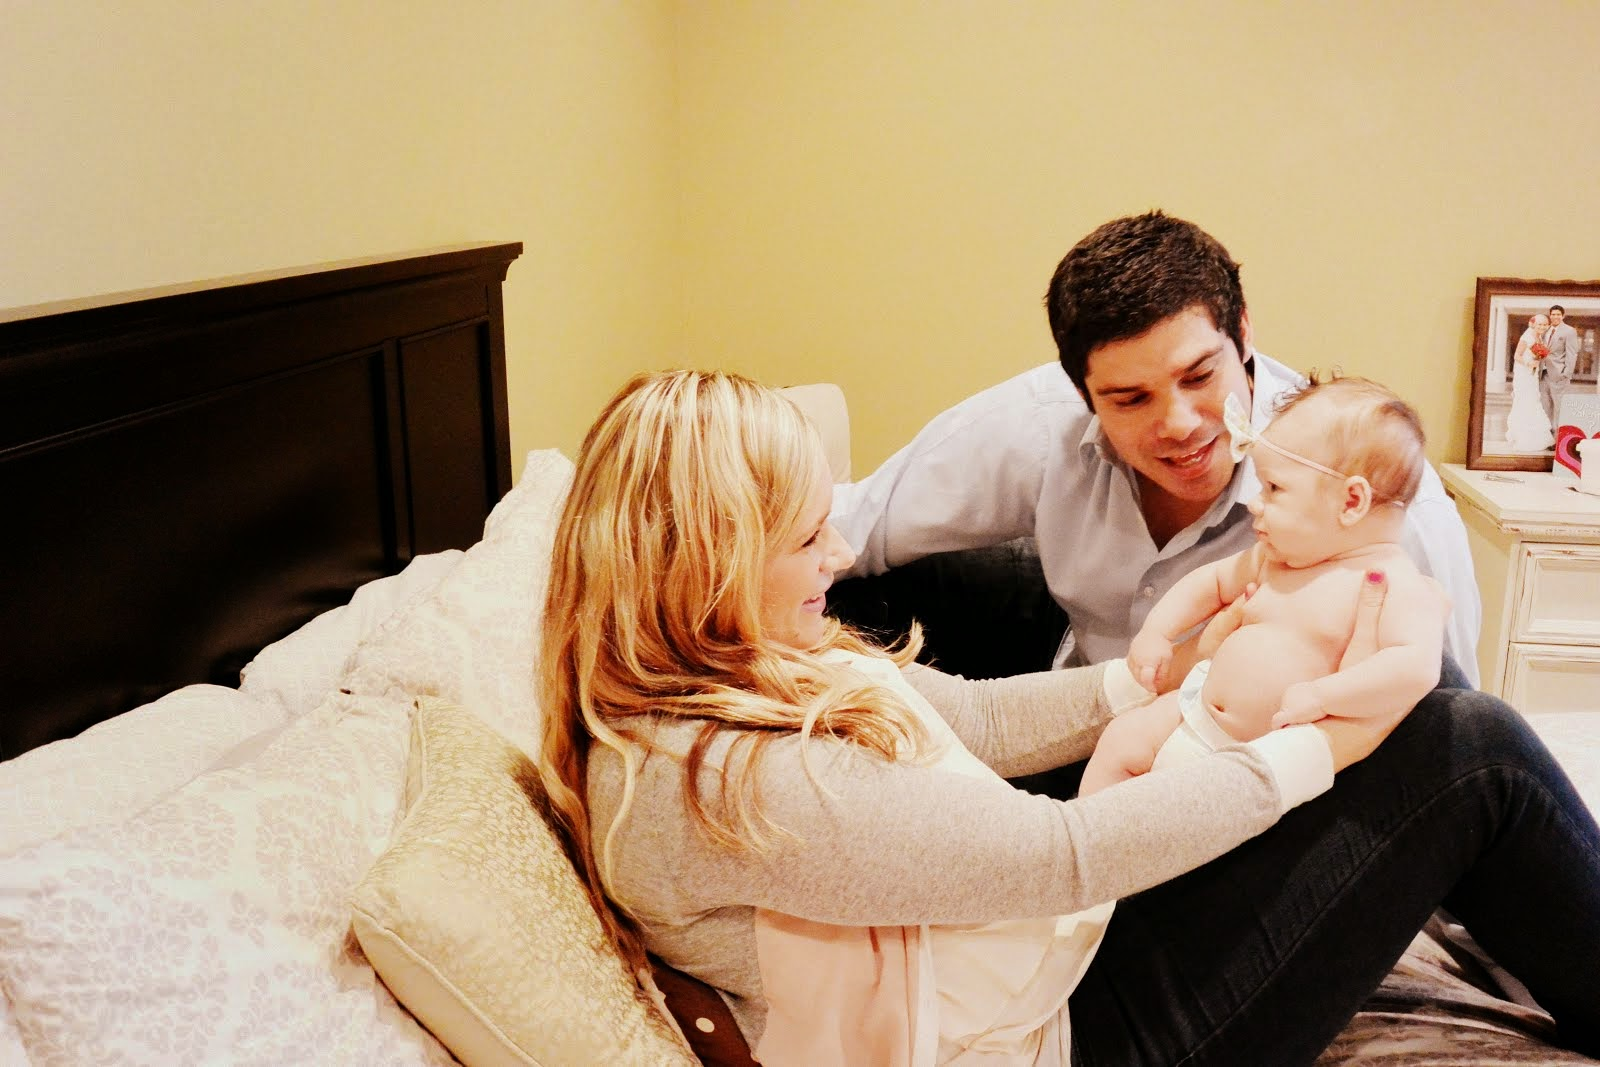 Imari, Brianne, and baby Baylinn